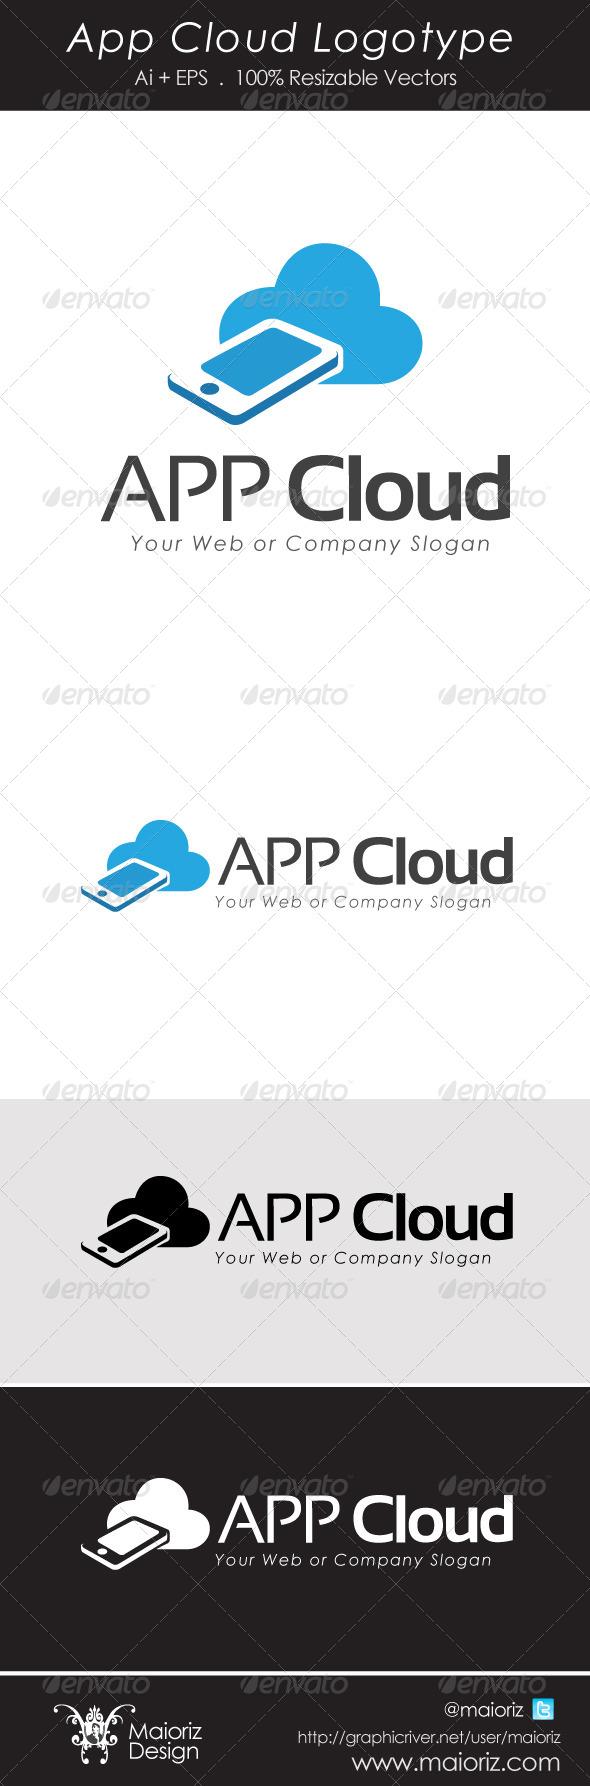 App Cloud Logotype